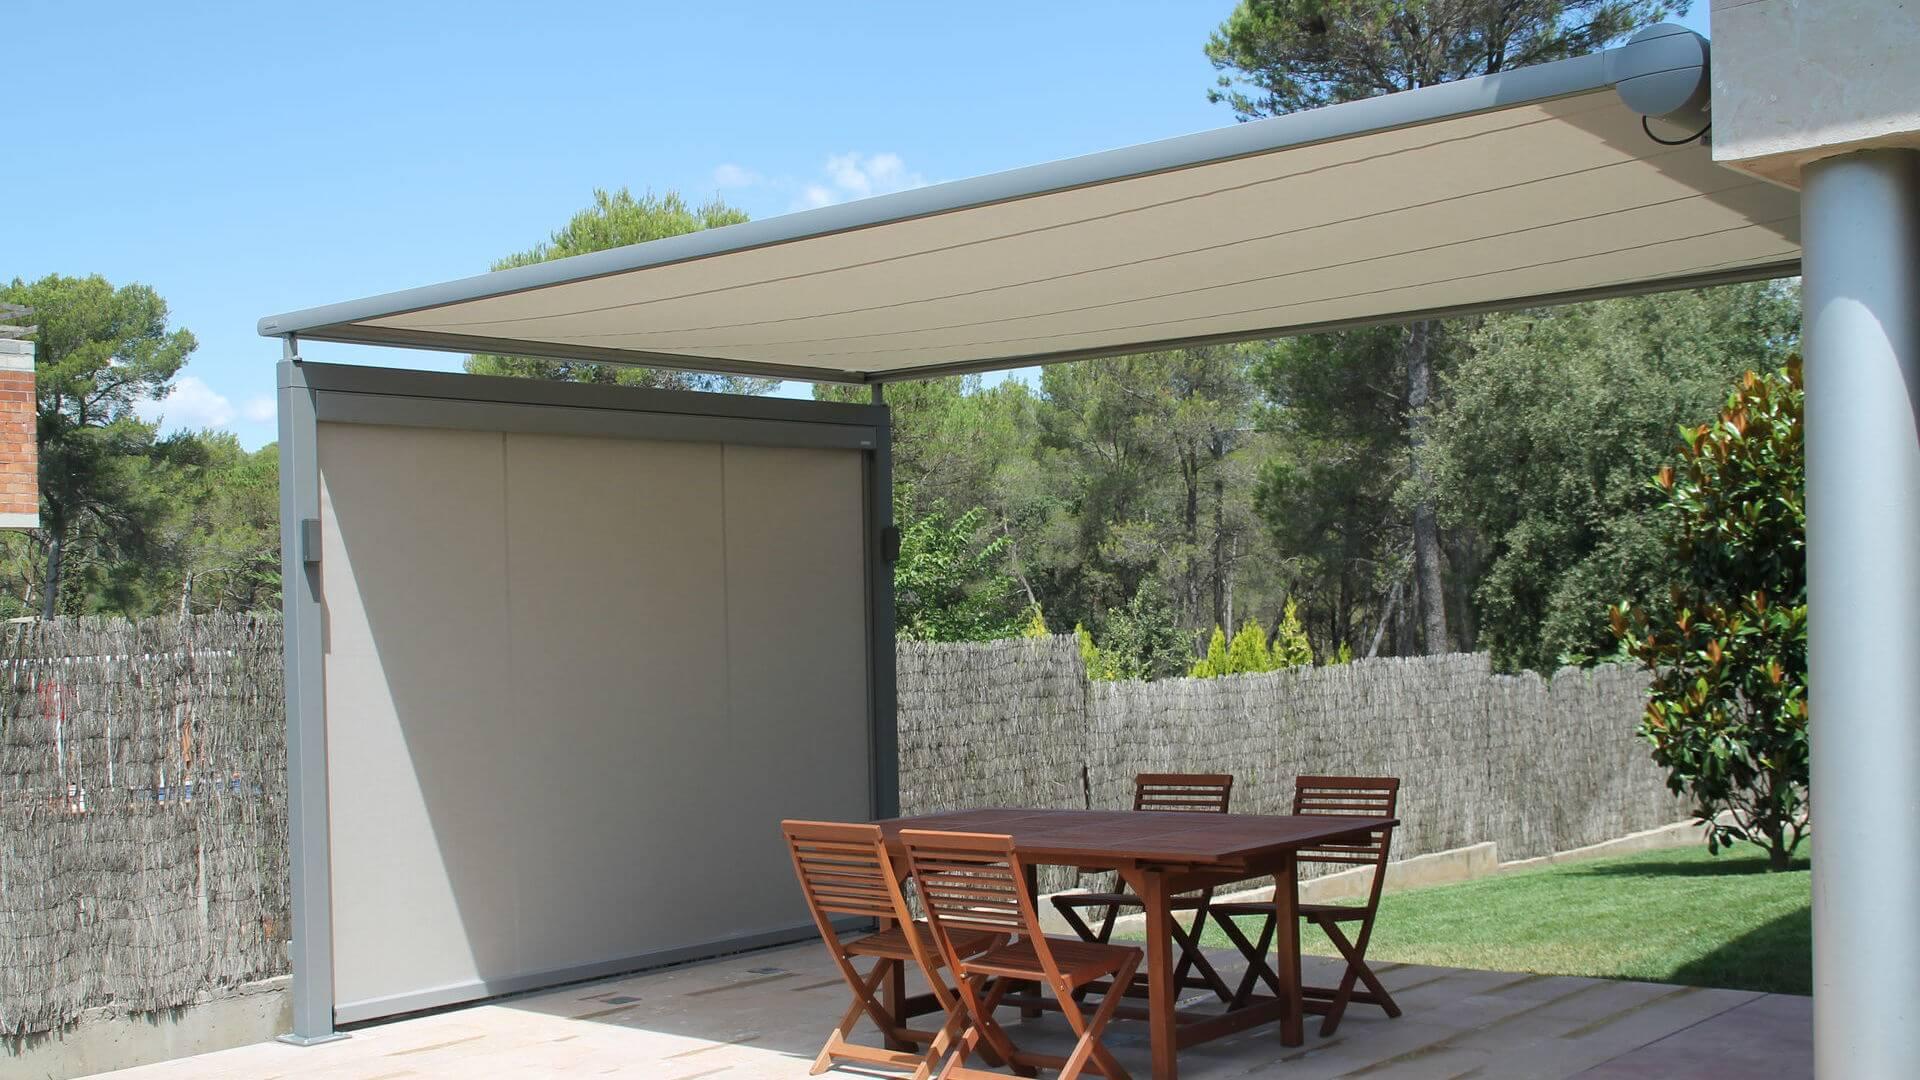 Markilux 620 toldo vertical terraza